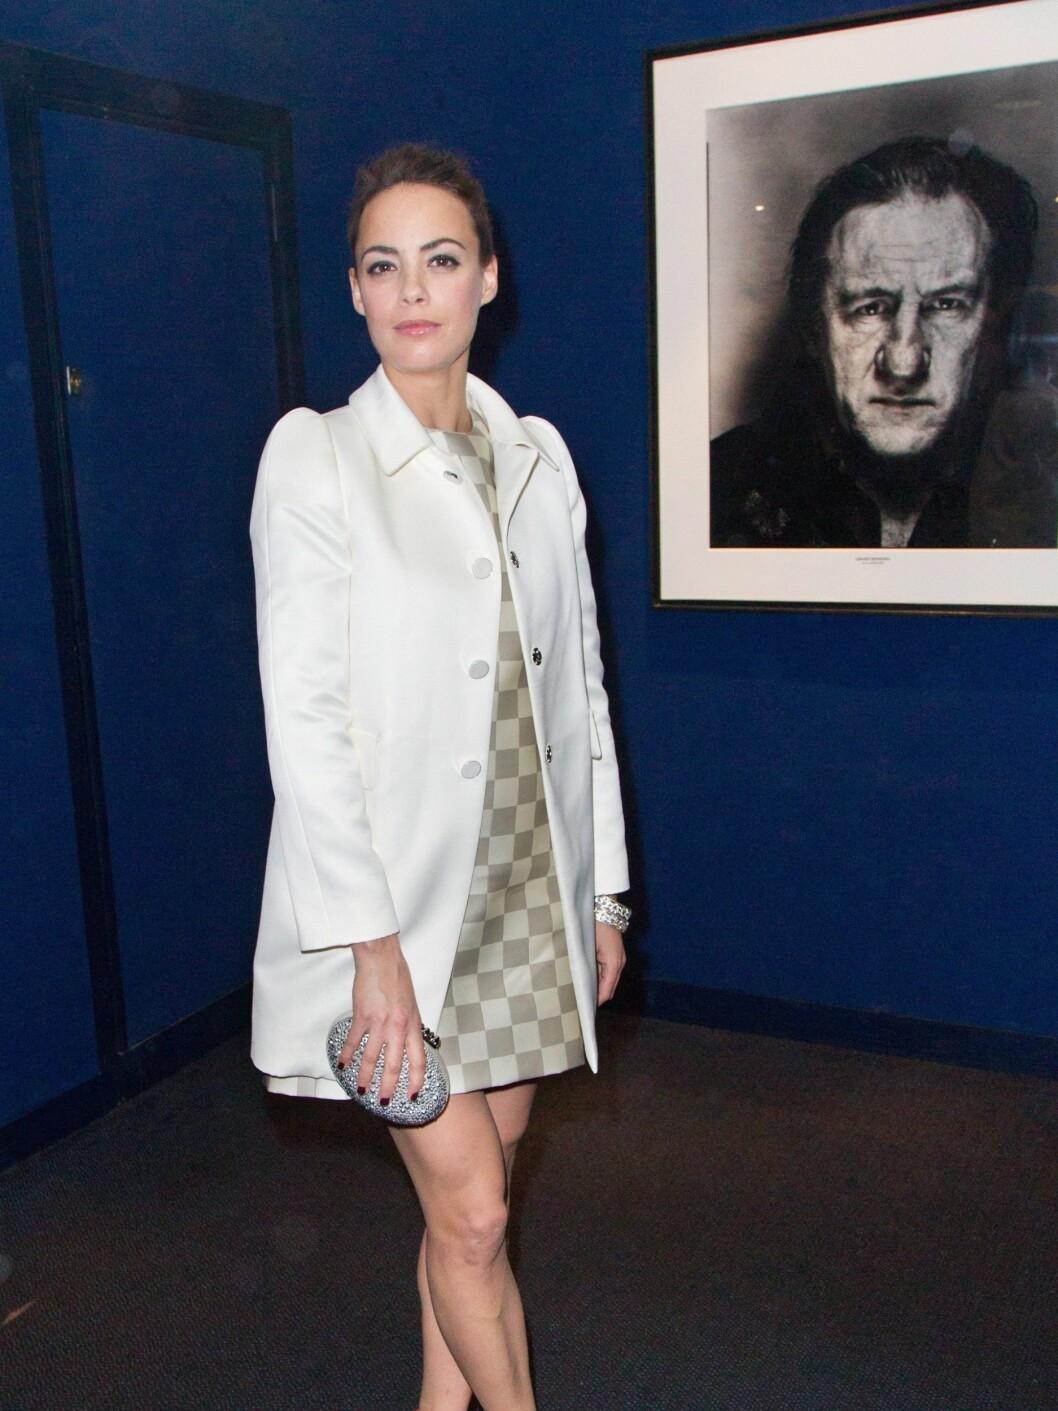 Skuespiller Berenice Bejo på arrangement i Paris.  Foto: All Over Press